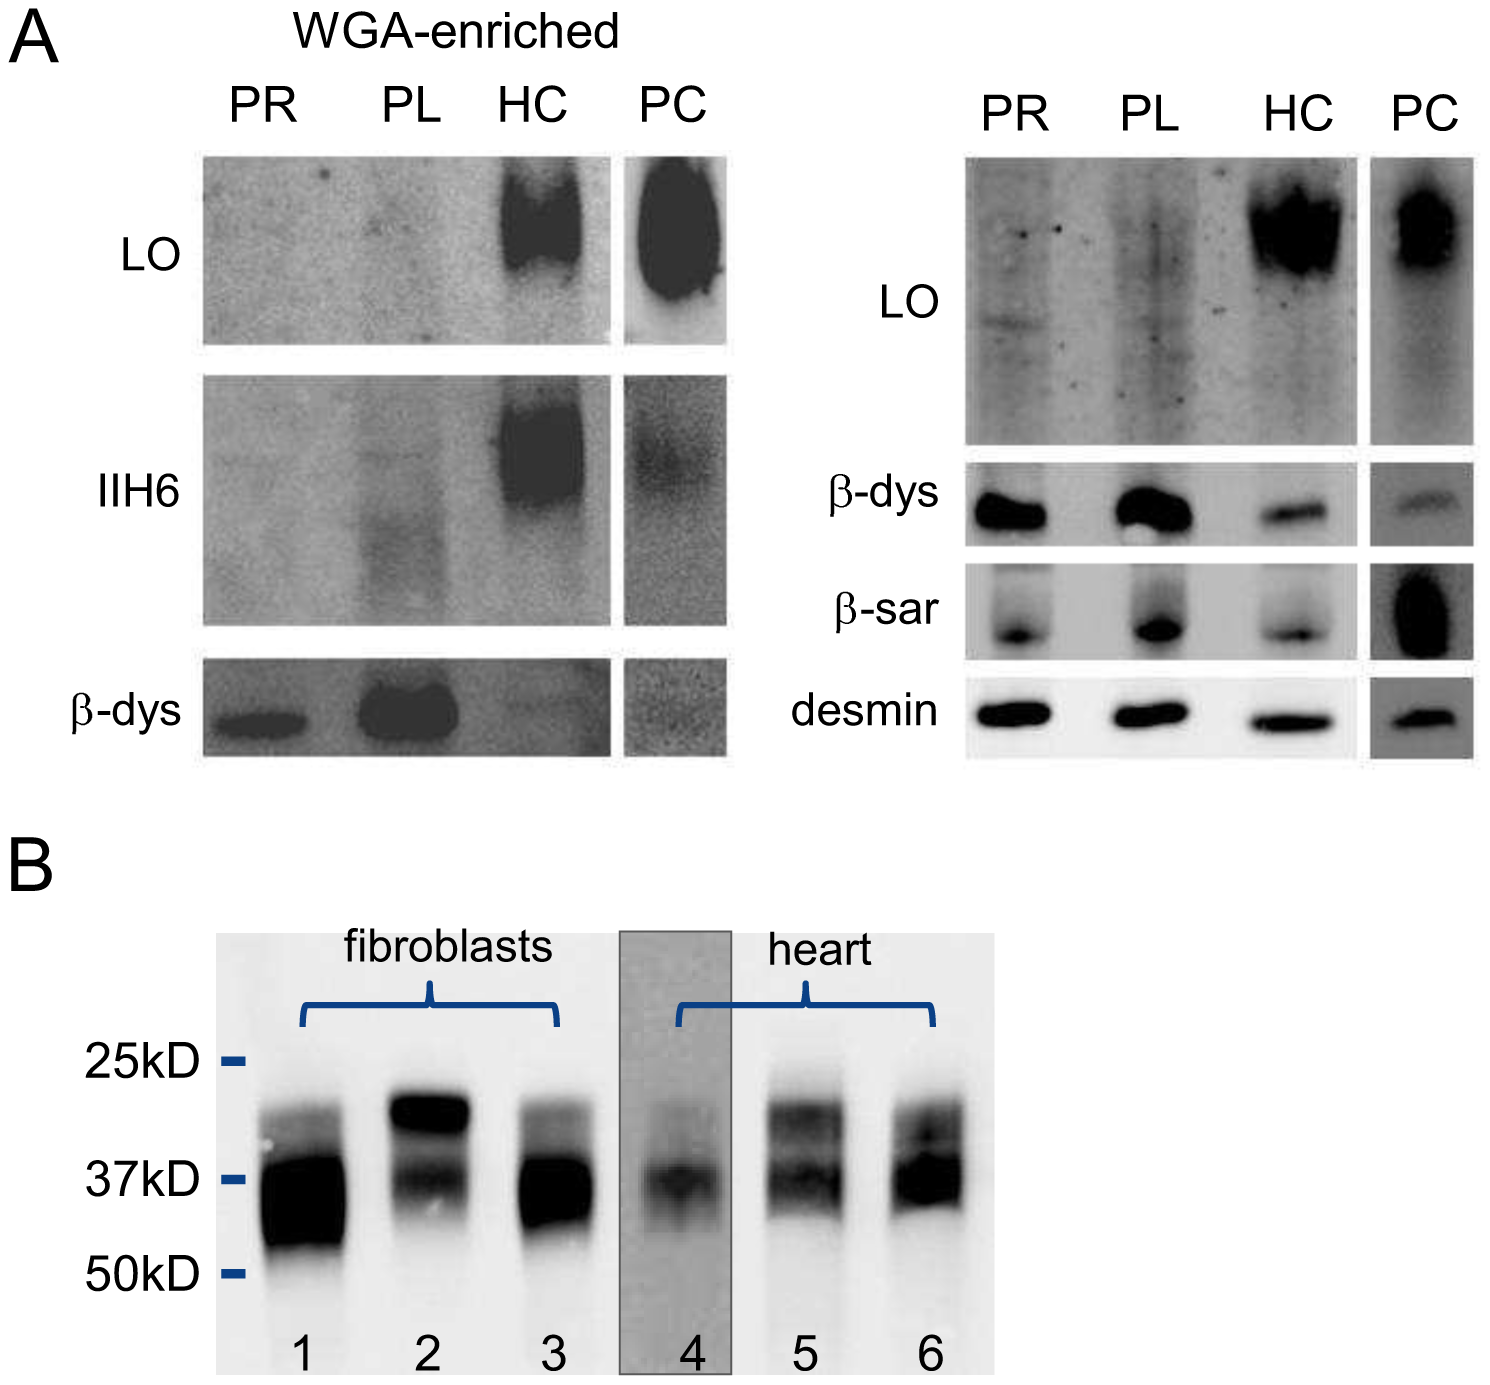 Western blotting for analysis of O-mannosylation and N-glycosylation.